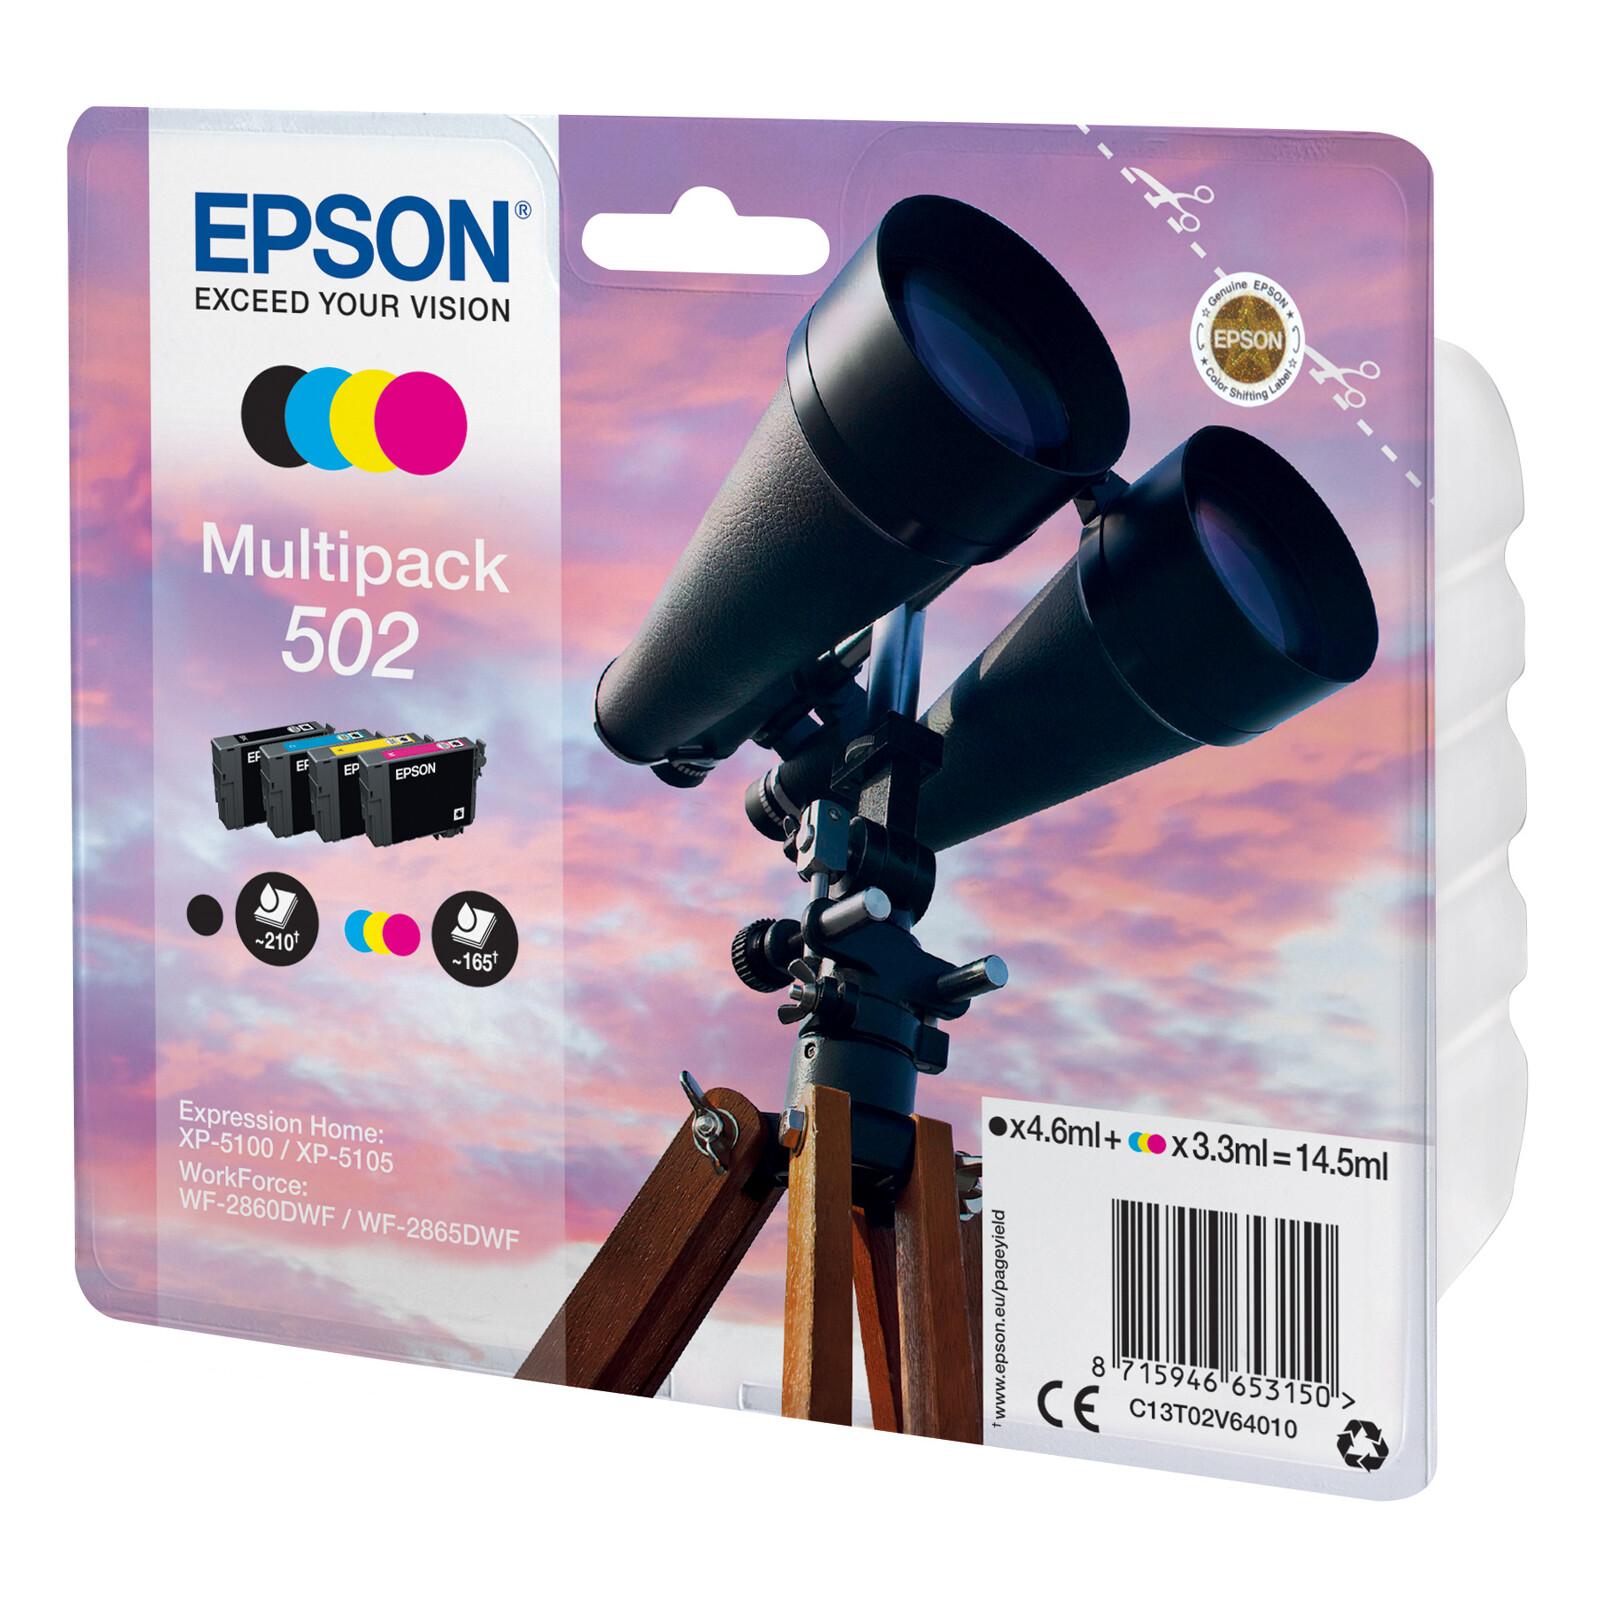 Epson 502 Tinte Multipack